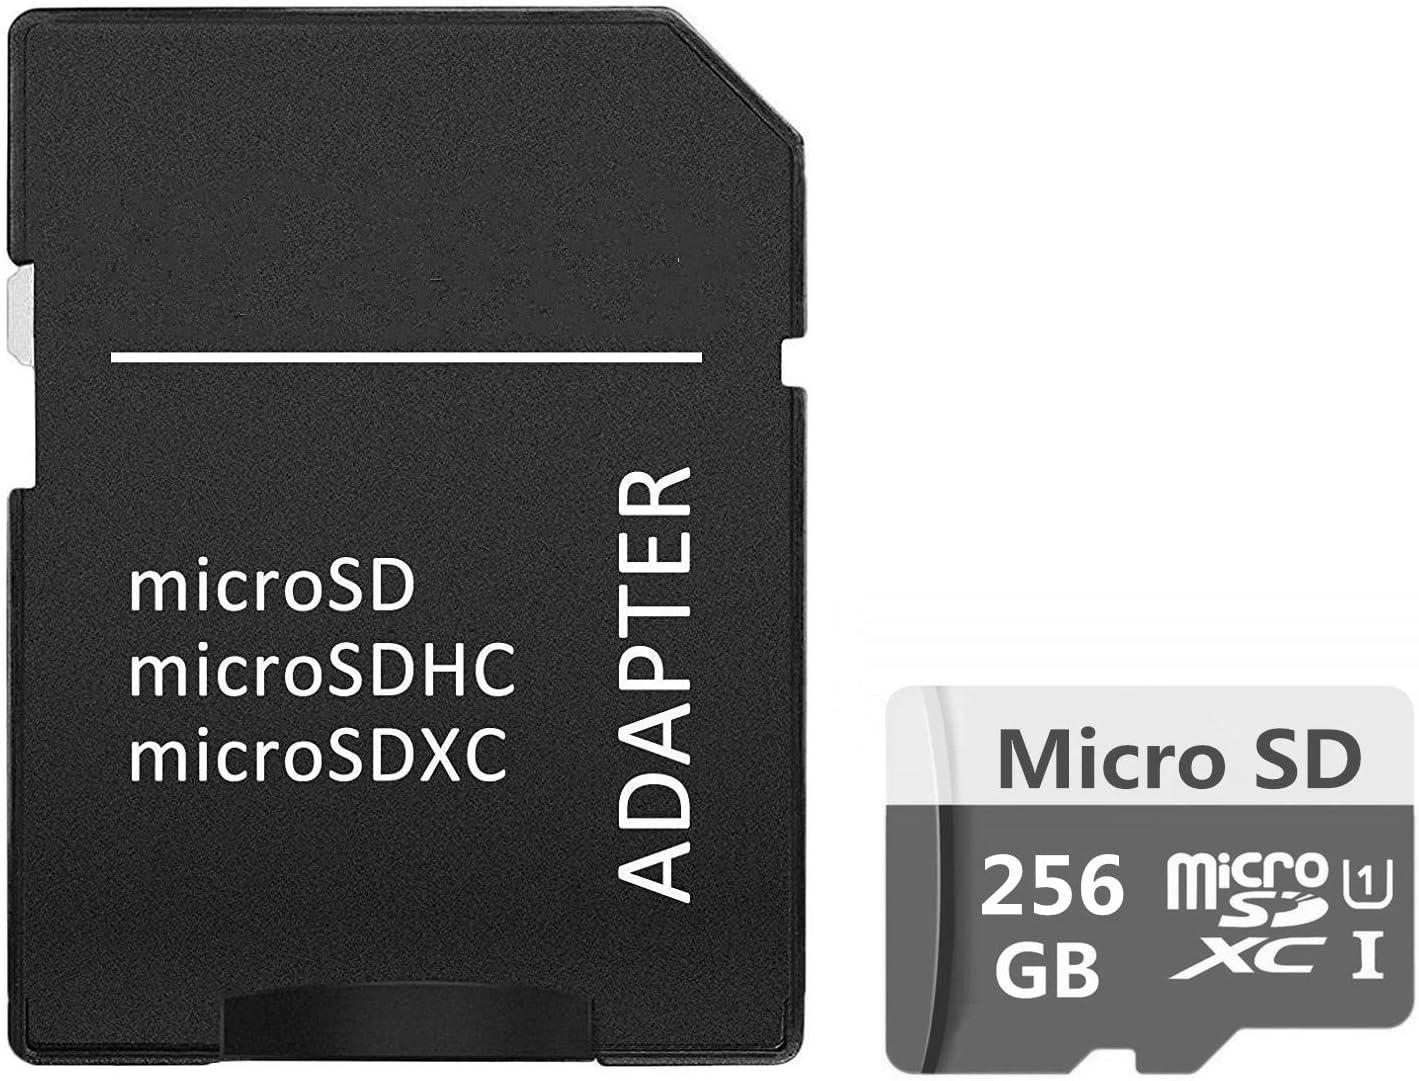 Micro SDXC UHS-I Card High Speed Memory Card Gentai Micro SD Card 128GB//256GB//400GB//512GB//1024GB 256GB-B